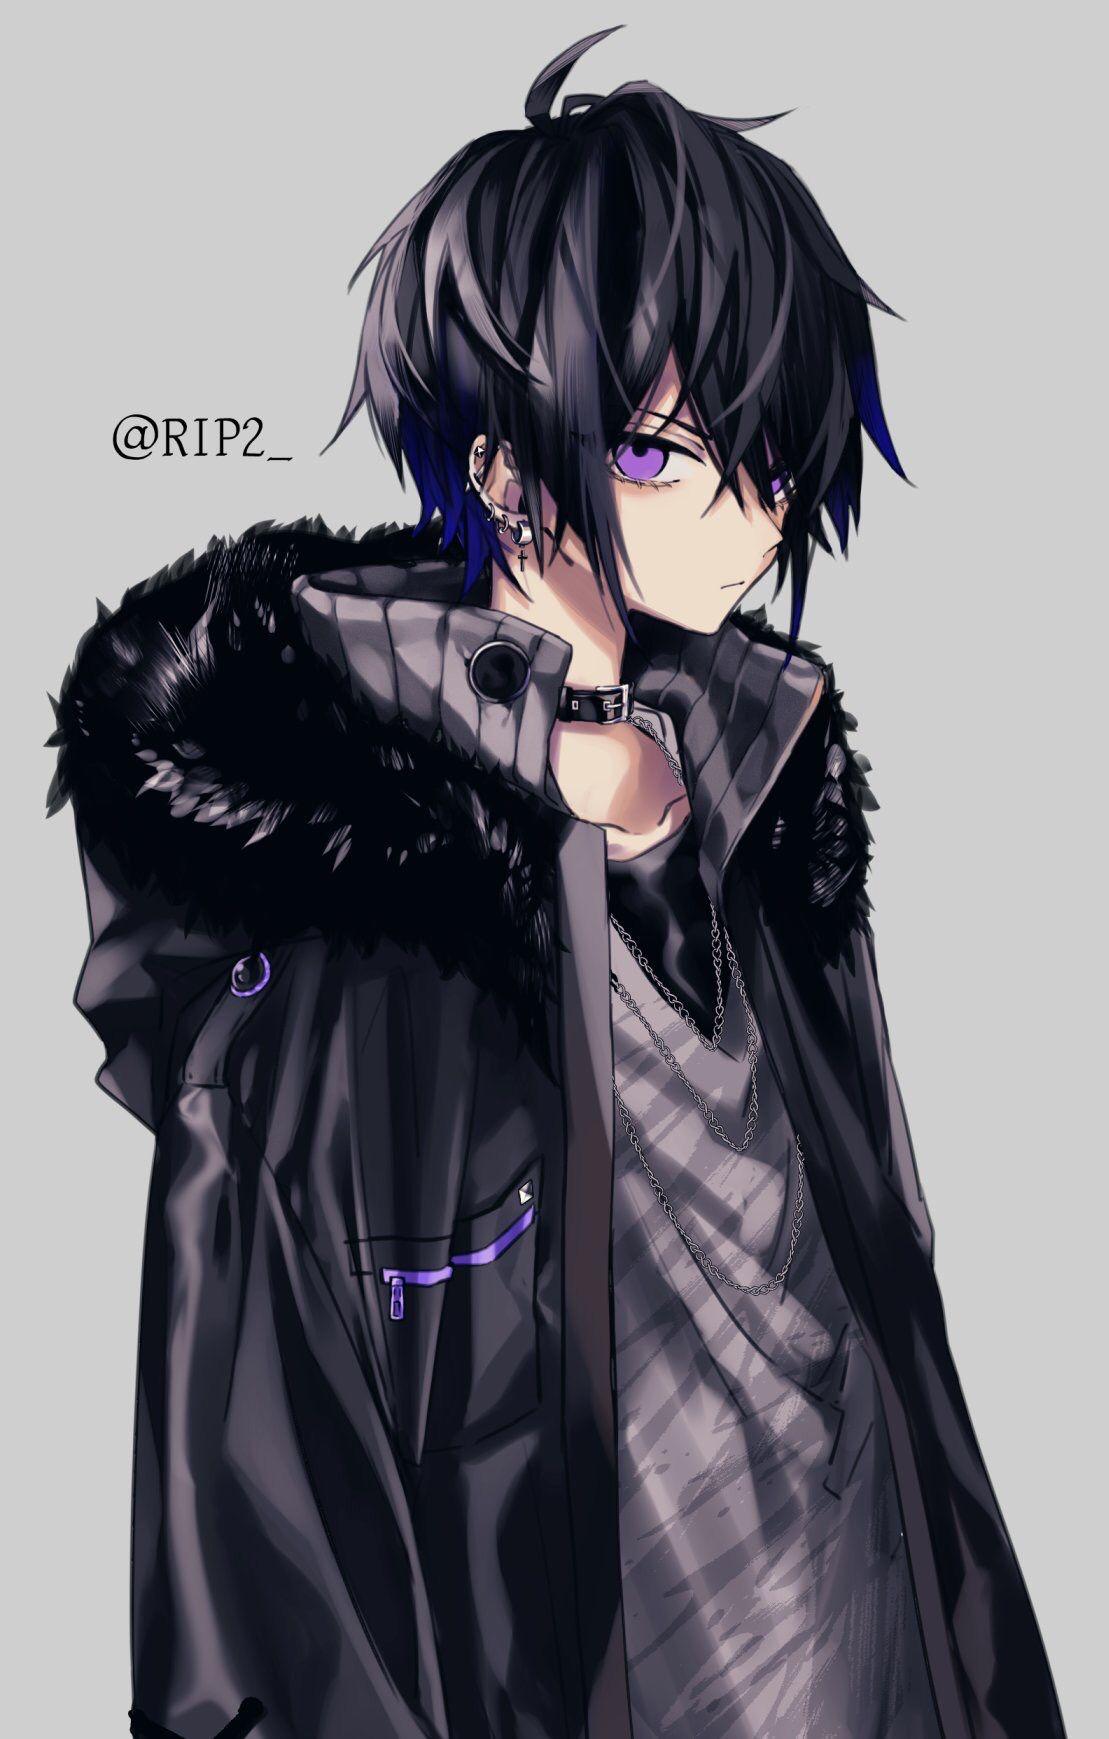 Pin By Wai On Anime Boy Dark Anime Guys Dark Anime Anime Guys